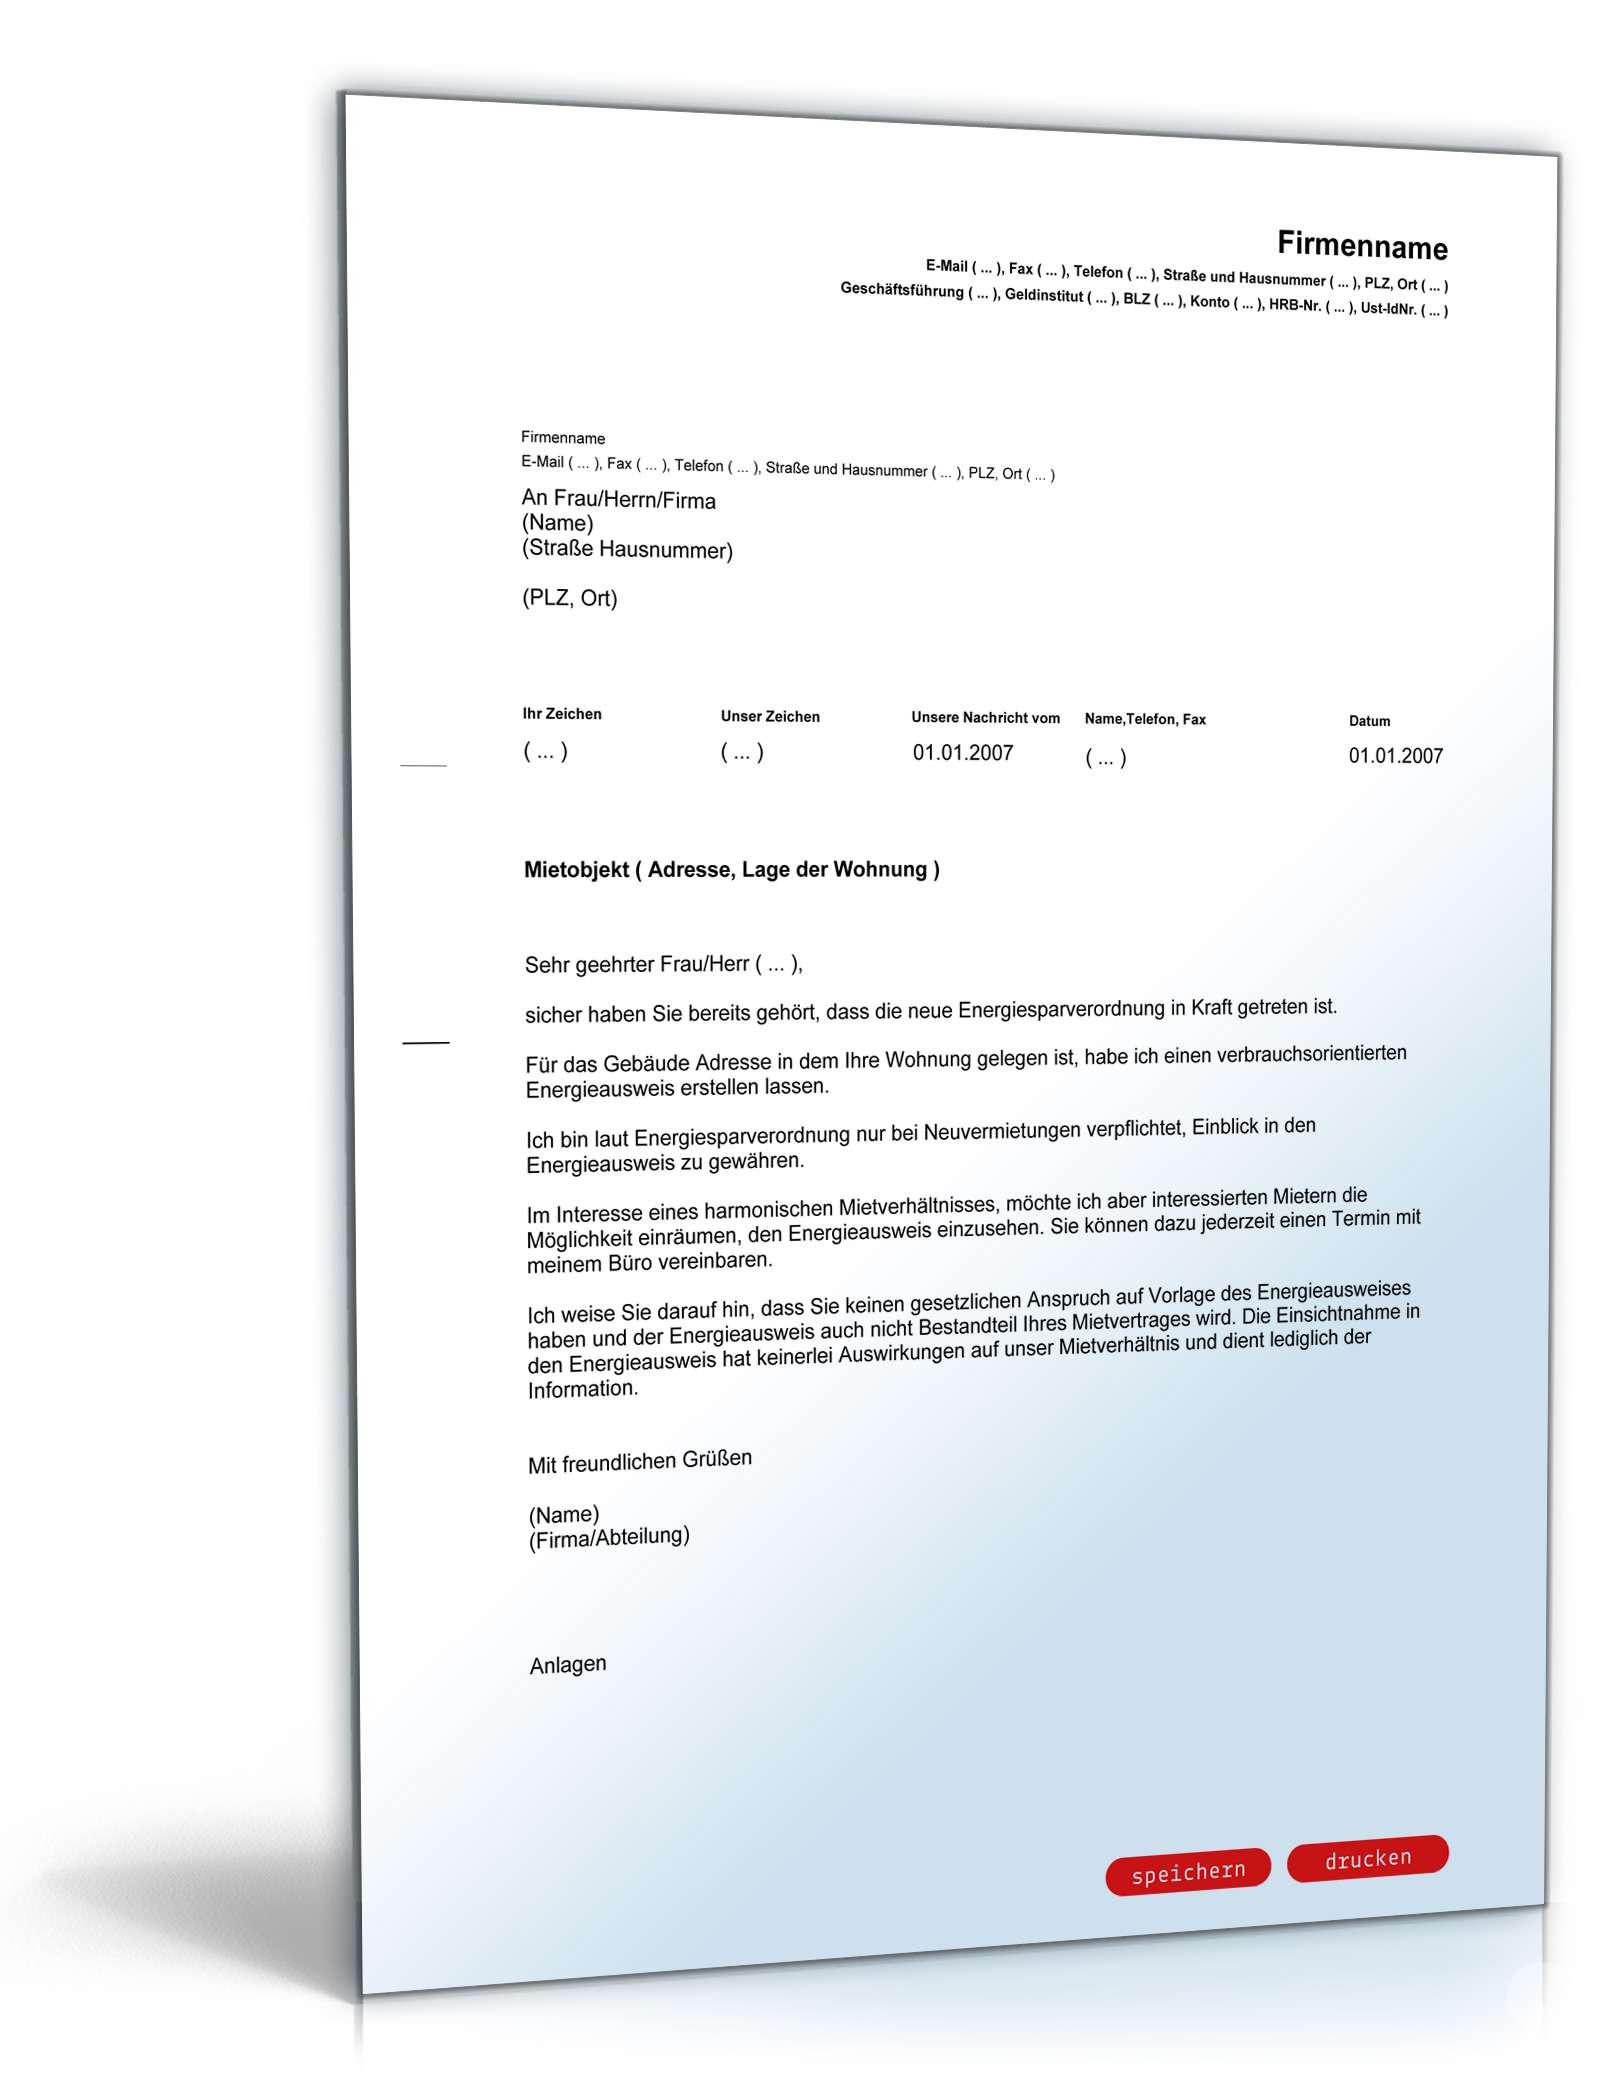 informationsauskunft energieausweis vorlage zum download. Black Bedroom Furniture Sets. Home Design Ideas